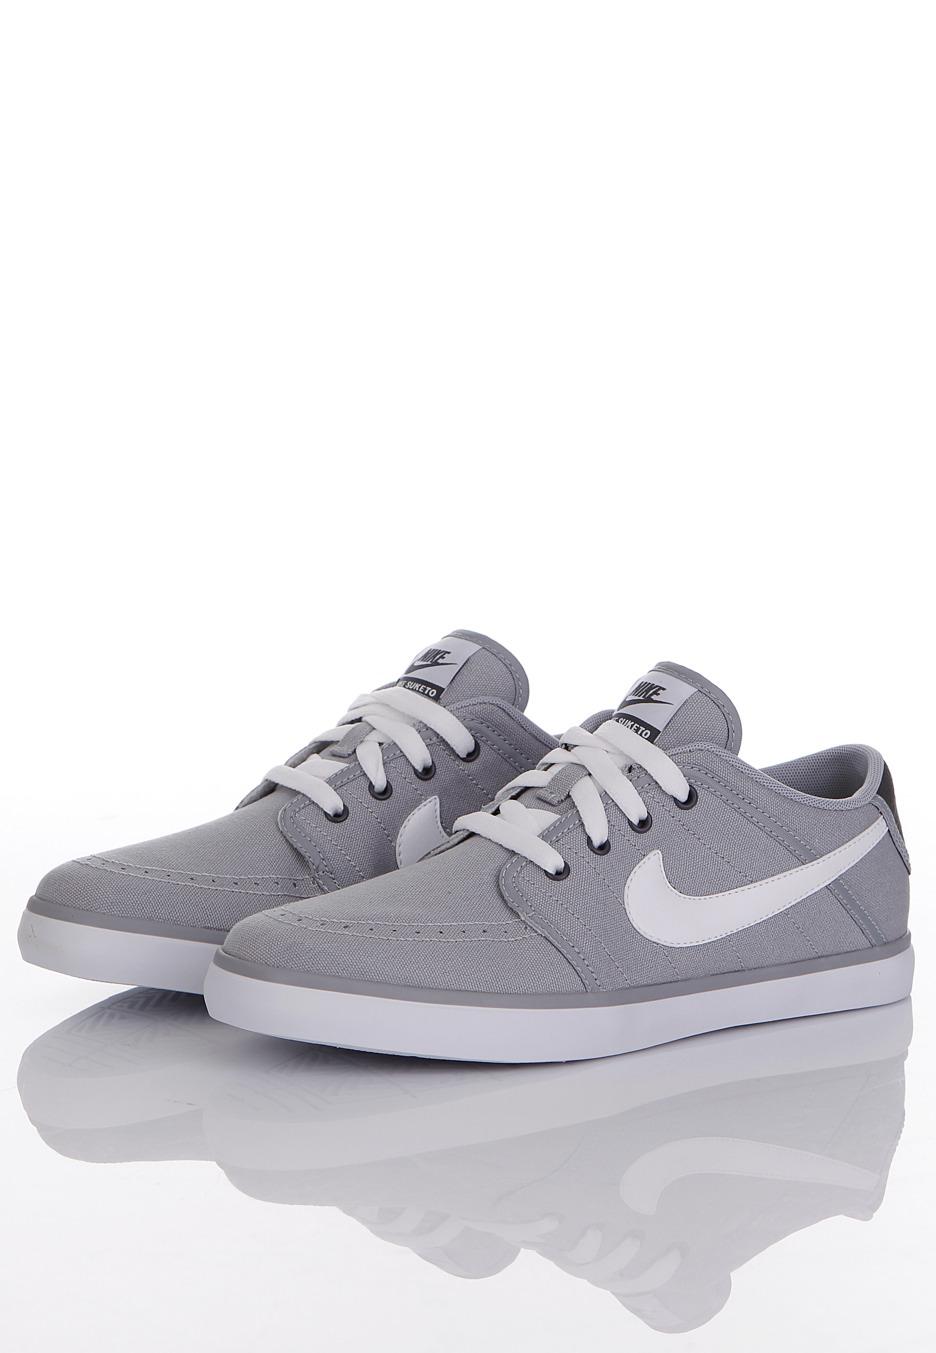 Nike - Suketo Wolf Grey White - Shoes - Impericon.com UK 6d3c43bb8d